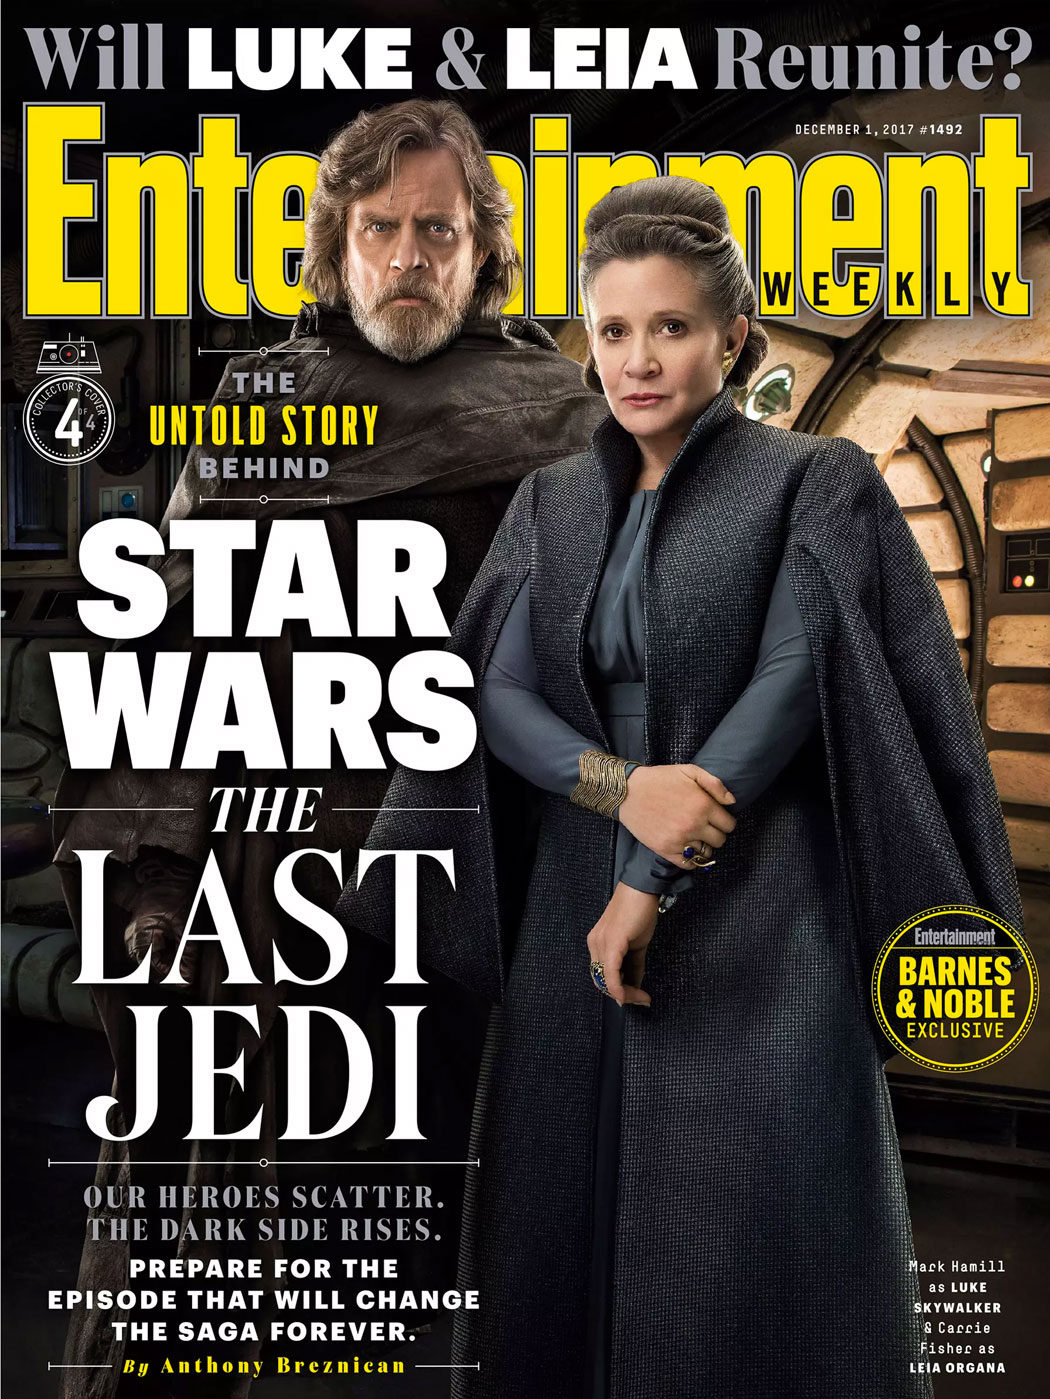 Portada Nº4 - Luke Skywalker y Leia